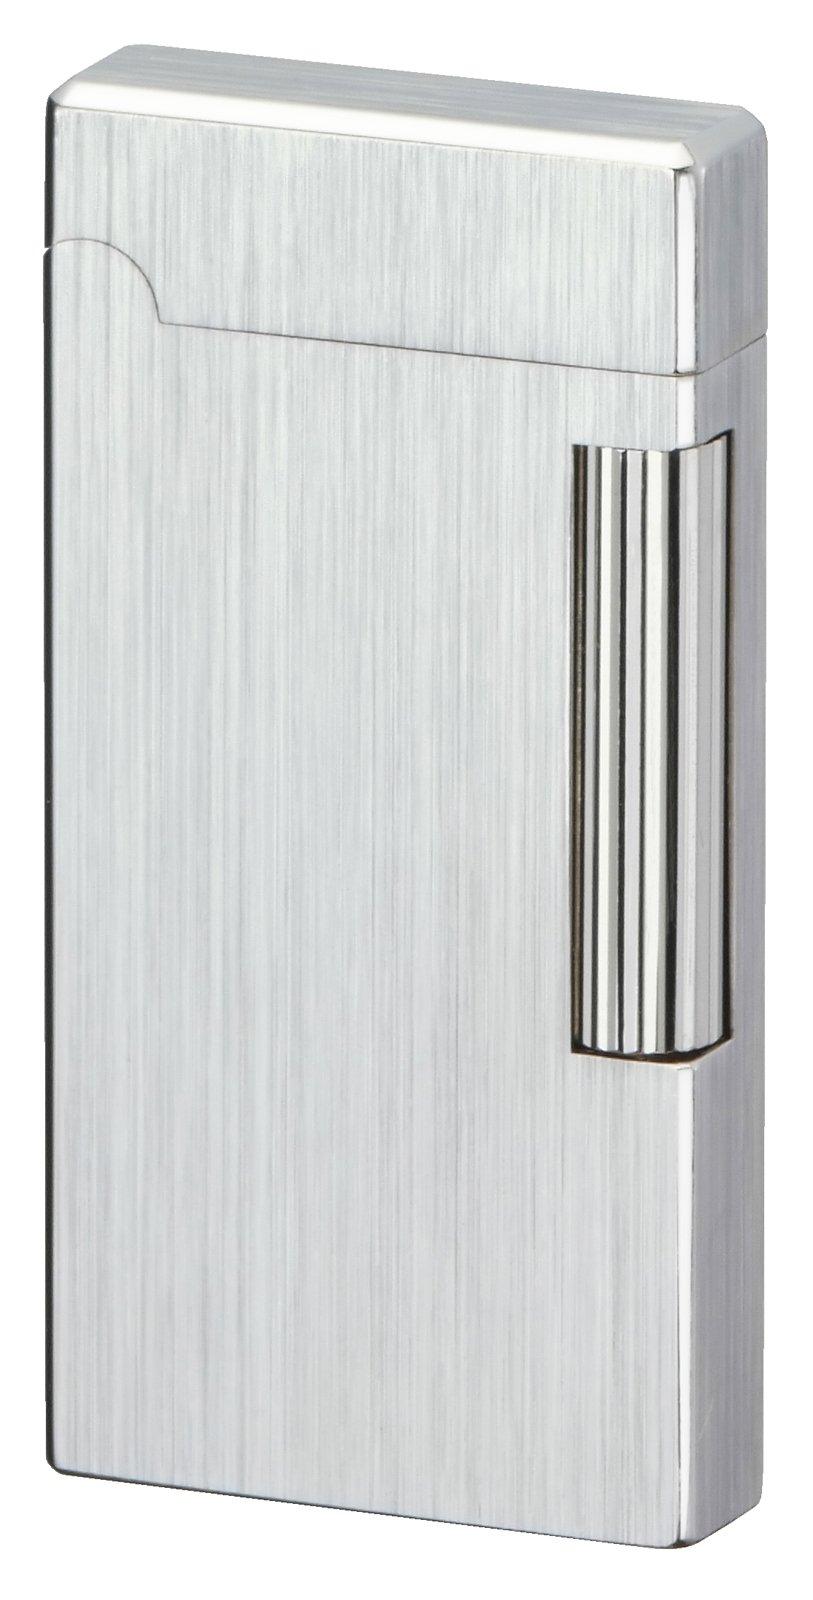 Sarome Flint Lighter SD6-13 Silver hairline